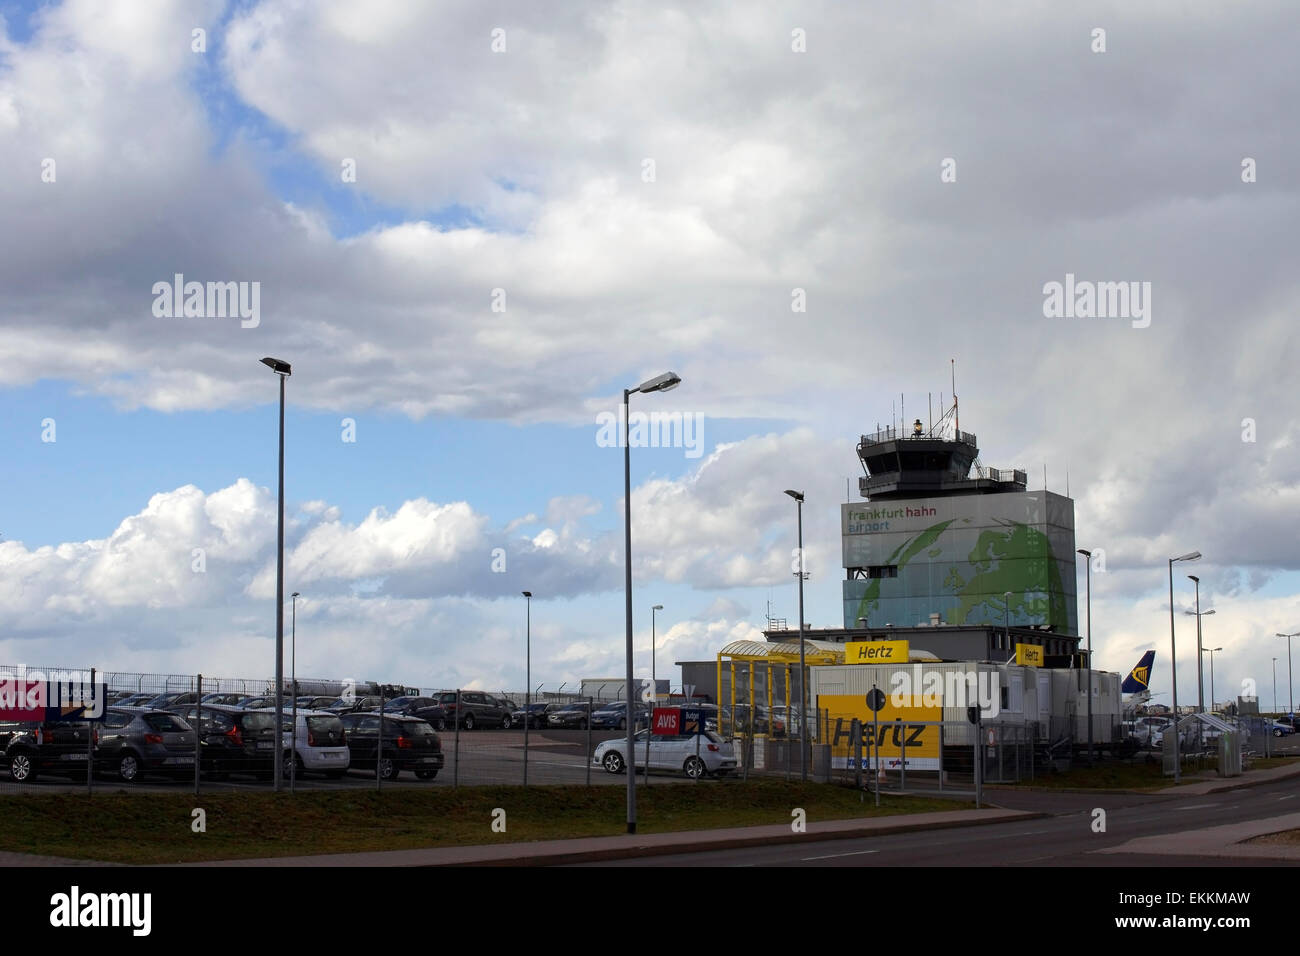 Hertz Car Rental Myrtle Beach International Airport